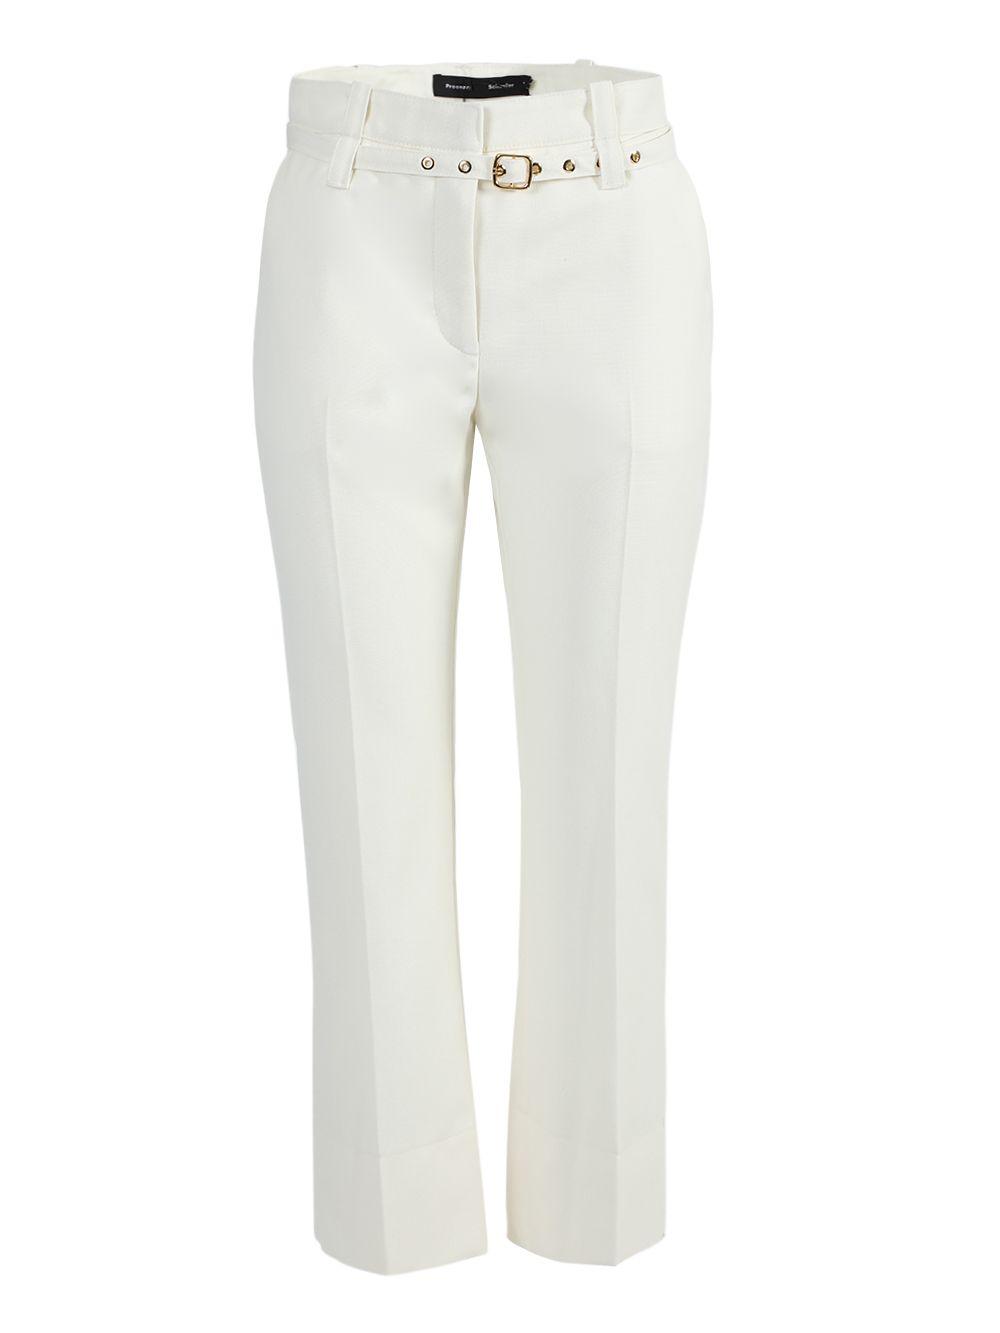 Proenza Schouler WHITE BELTED TUXEDO PANTS